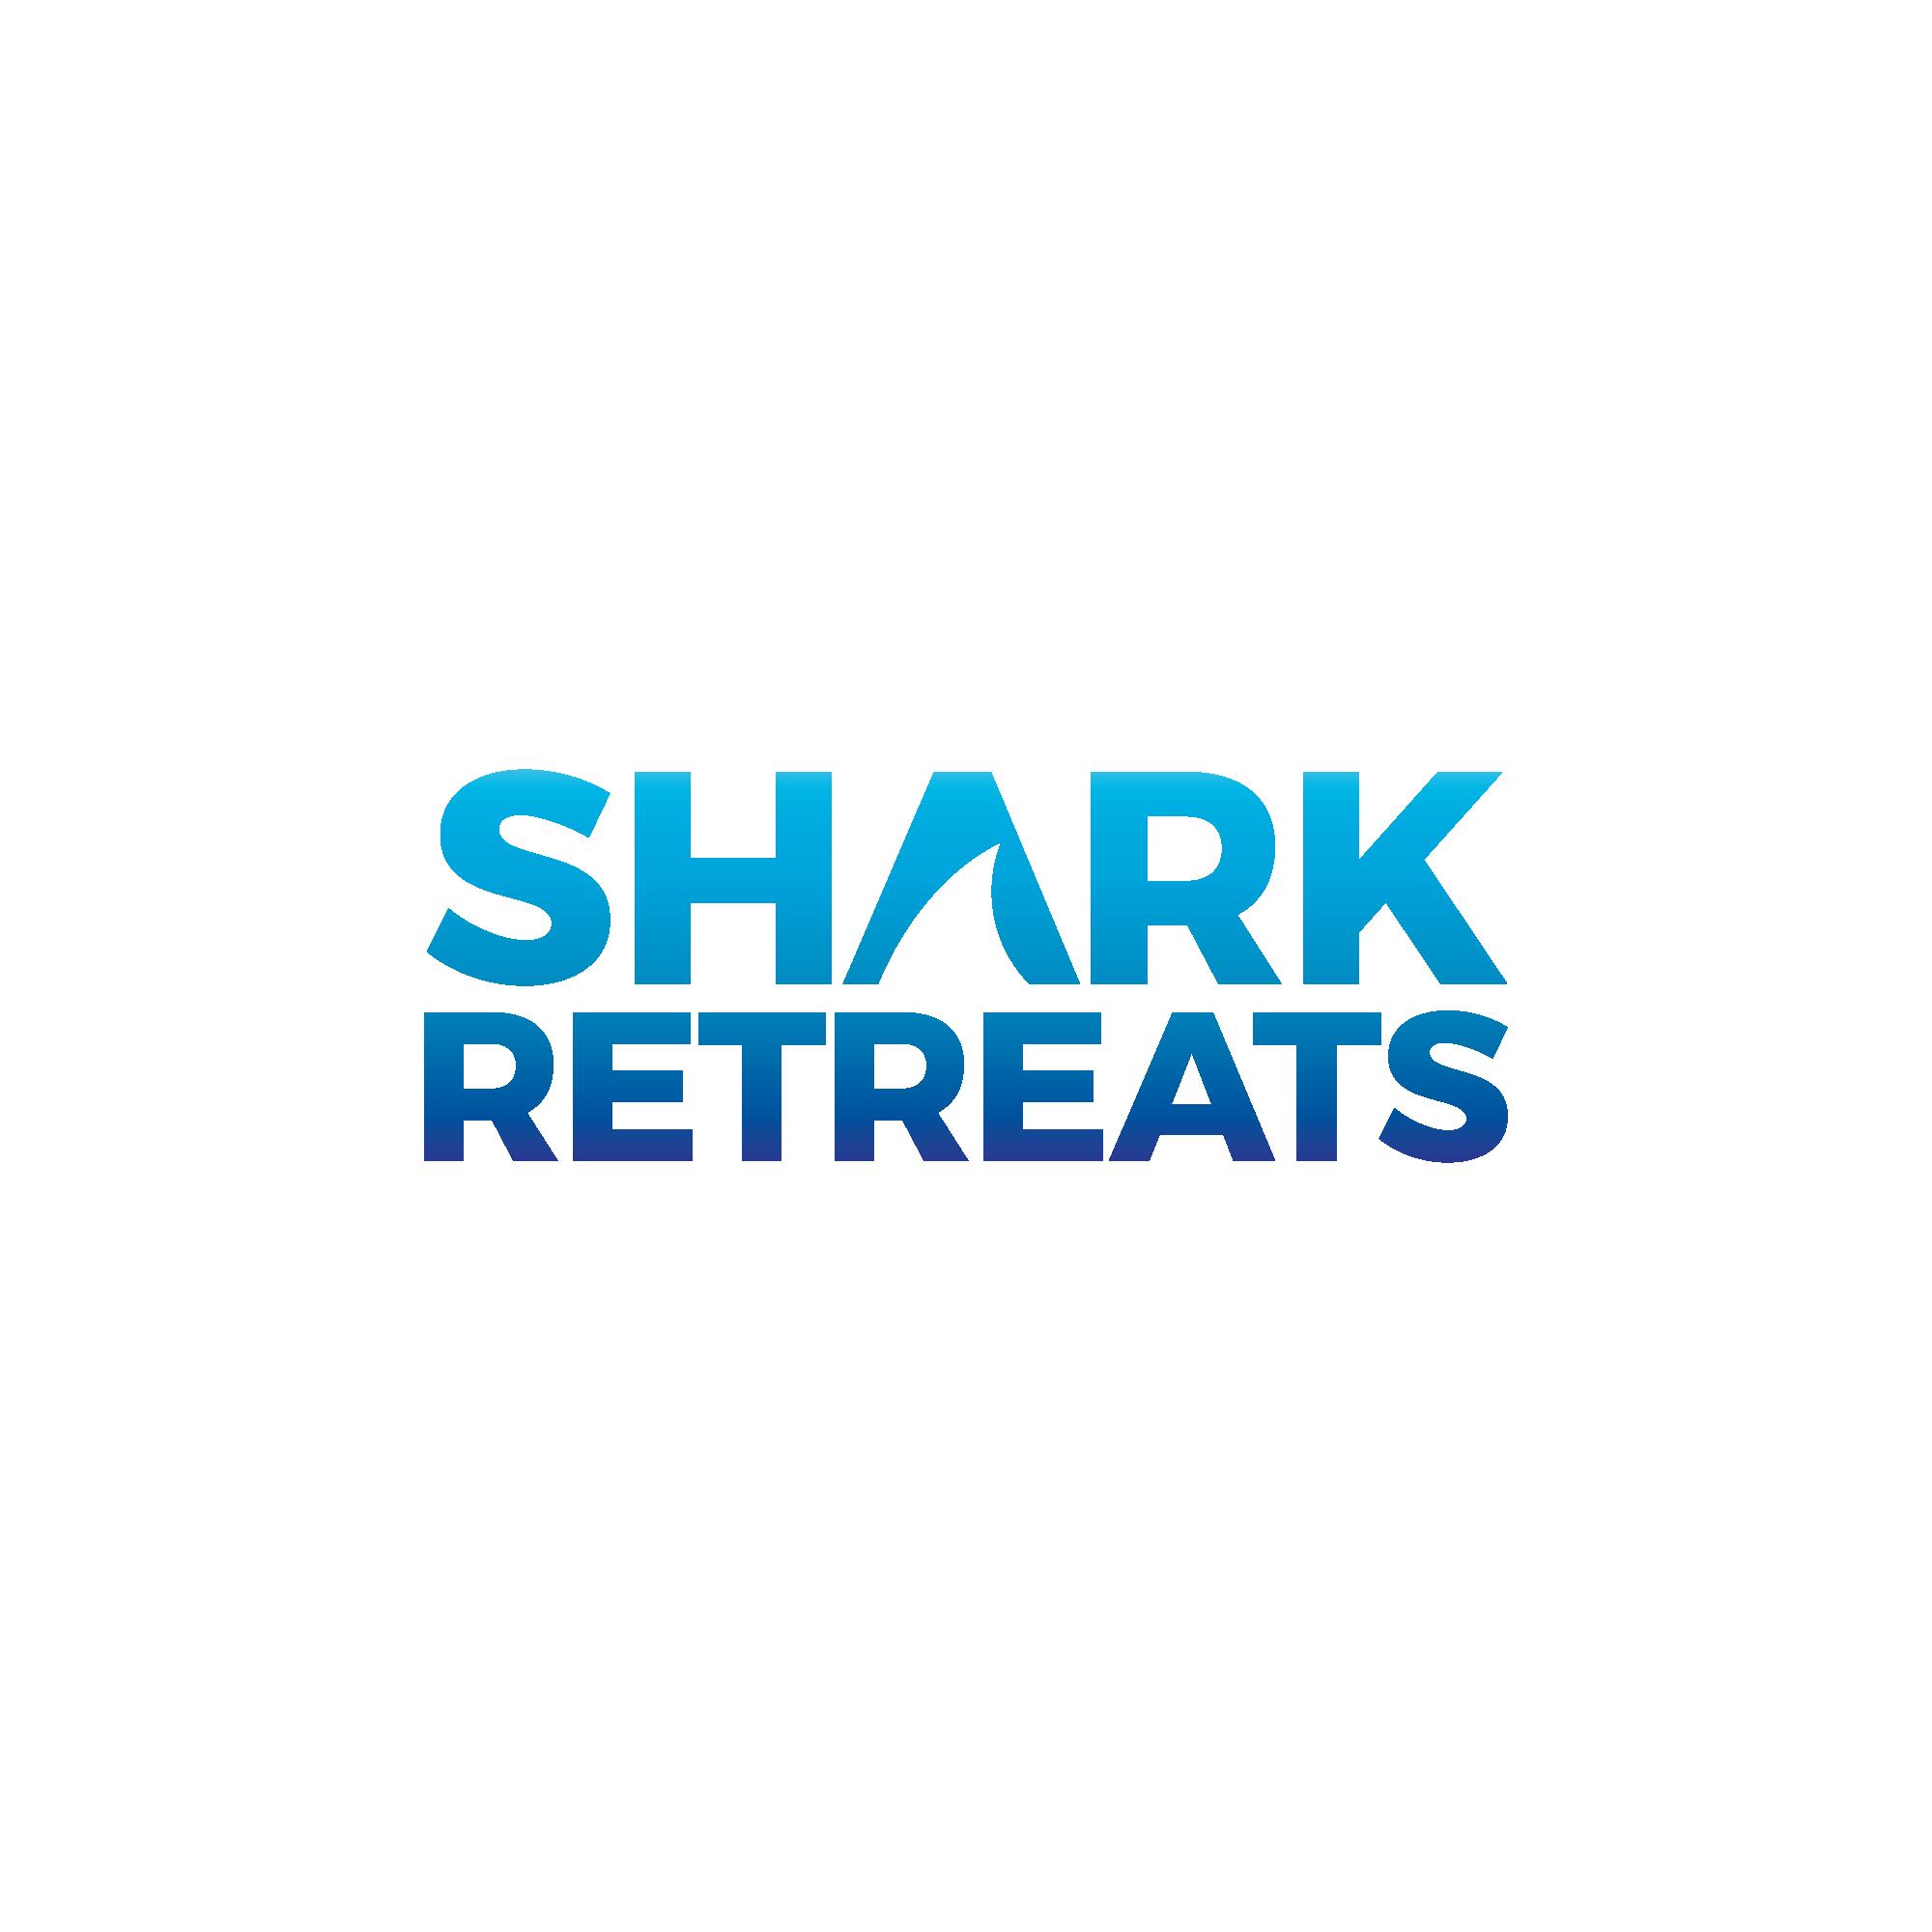 Shark Retreats